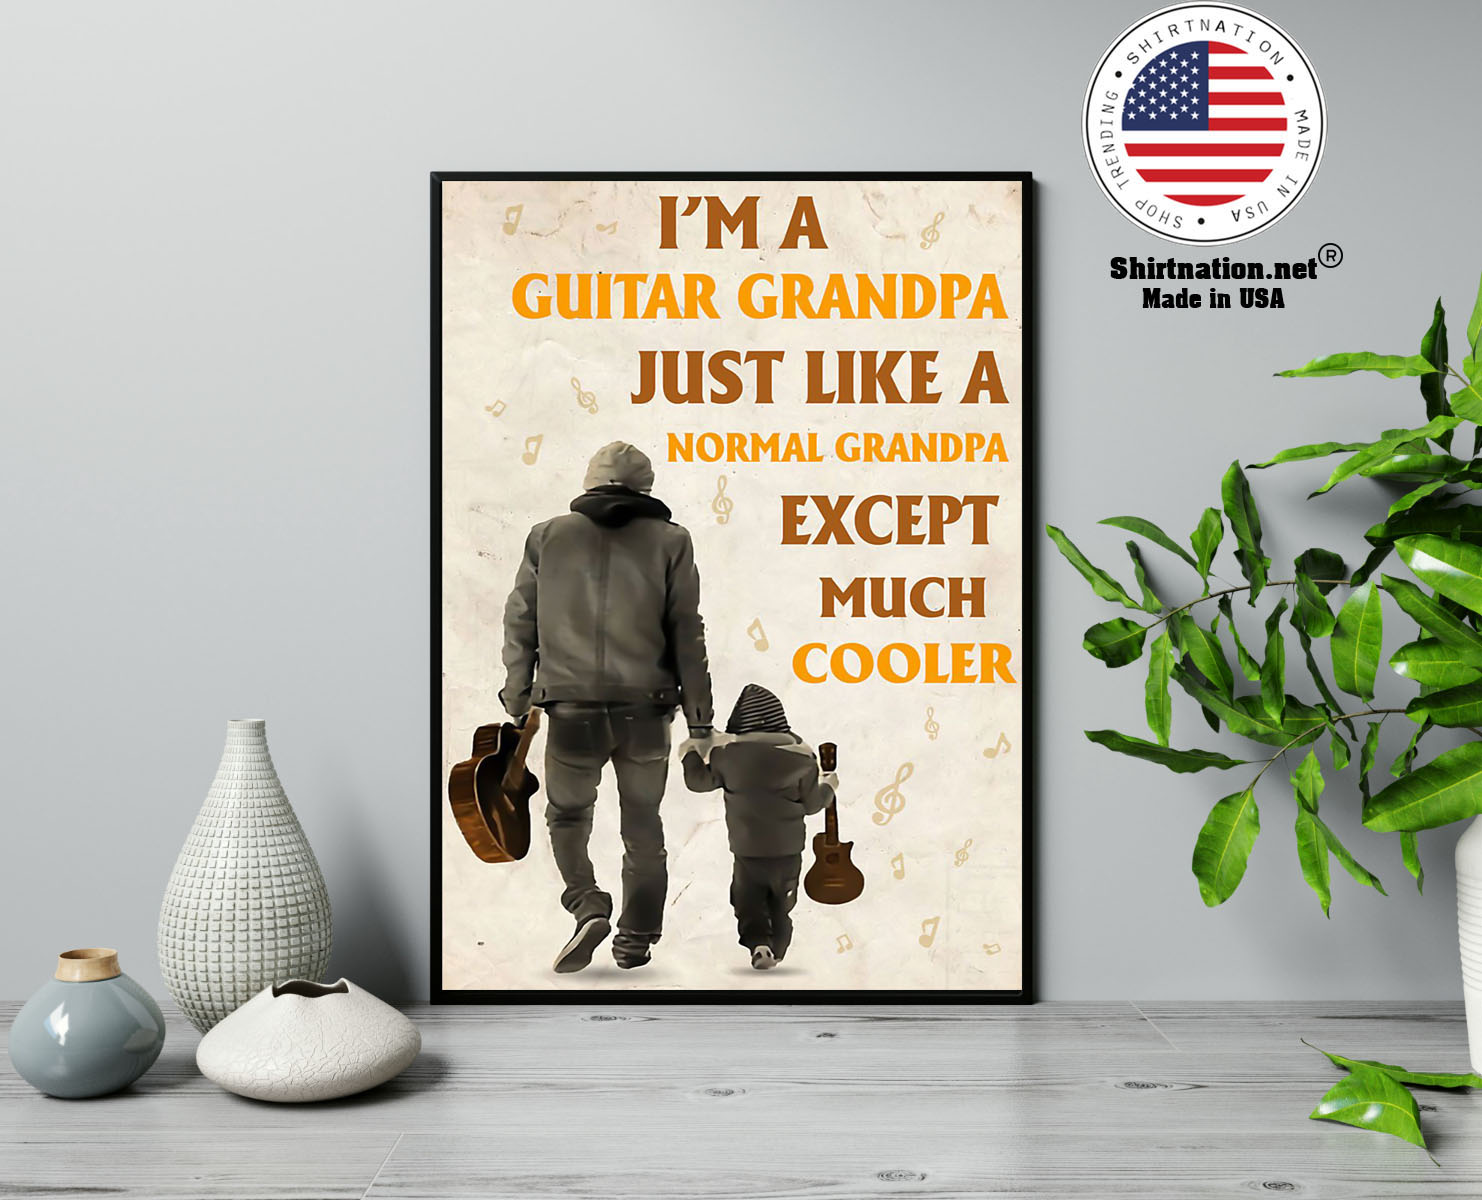 Im a guitar grandpa just like a normal grandpa except much cooler poster 13